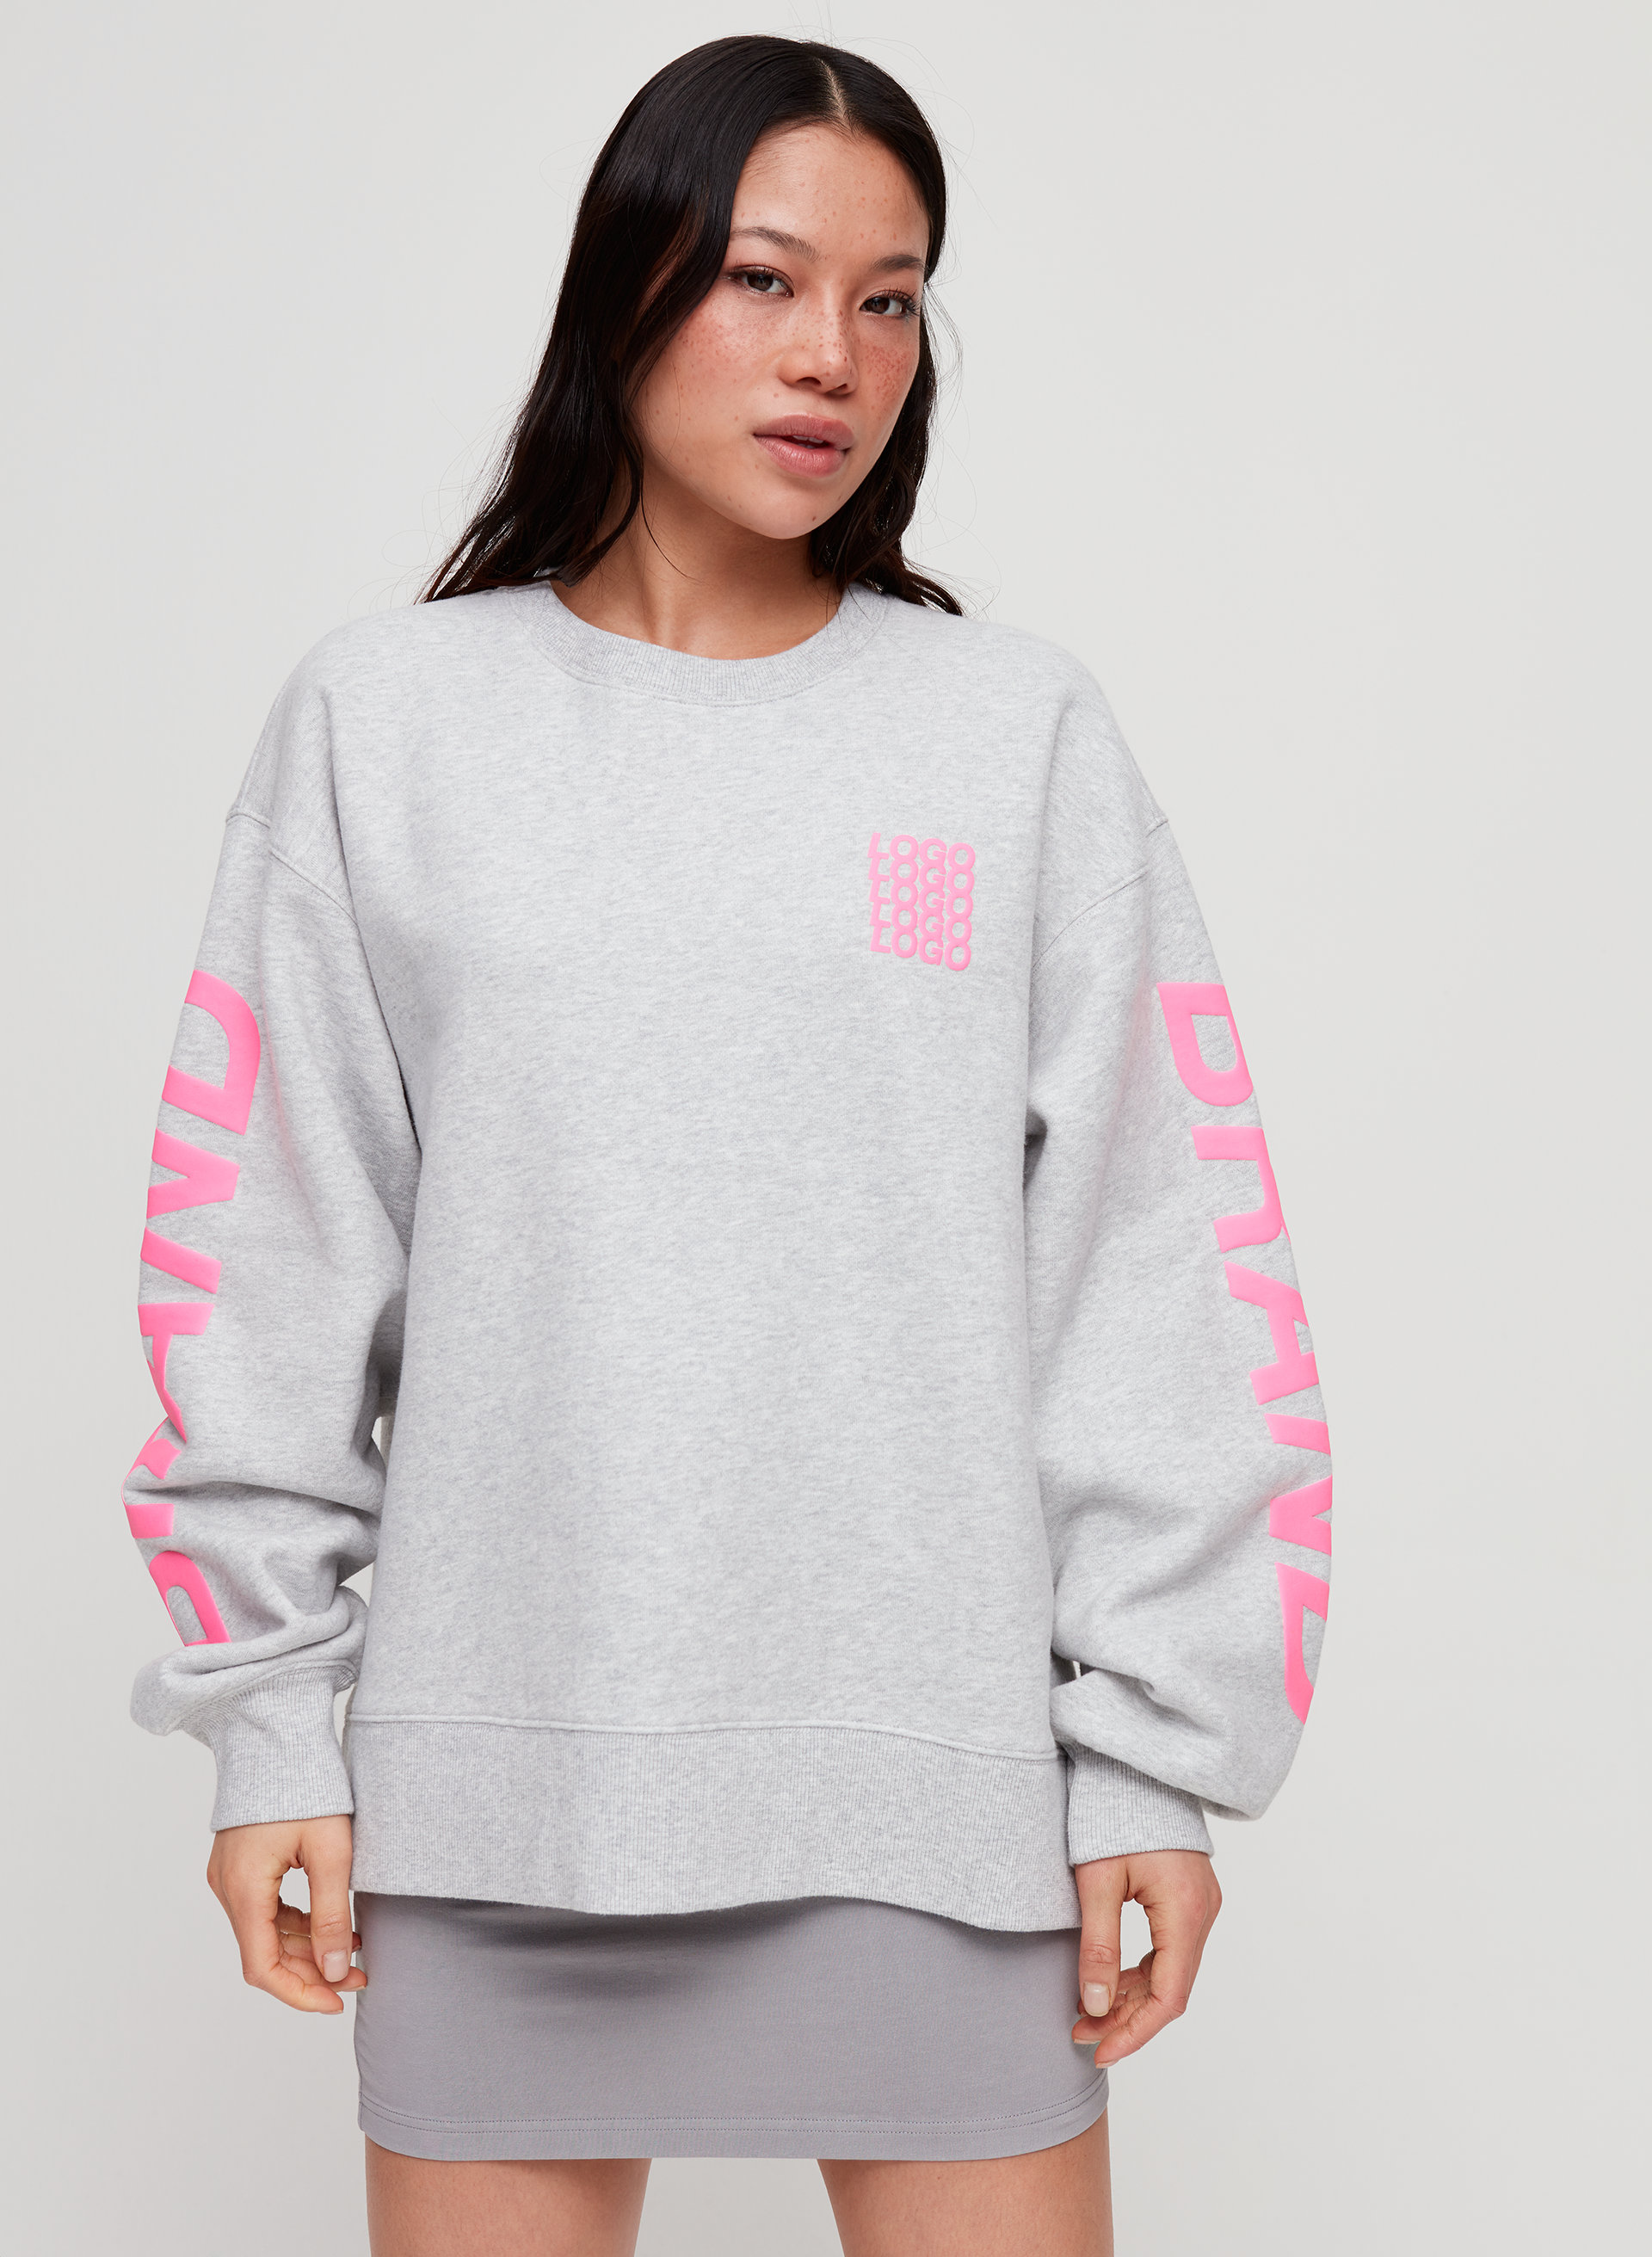 c21671e38 THE OVERSIZED CREW - Oversized crewneck sweatshirt